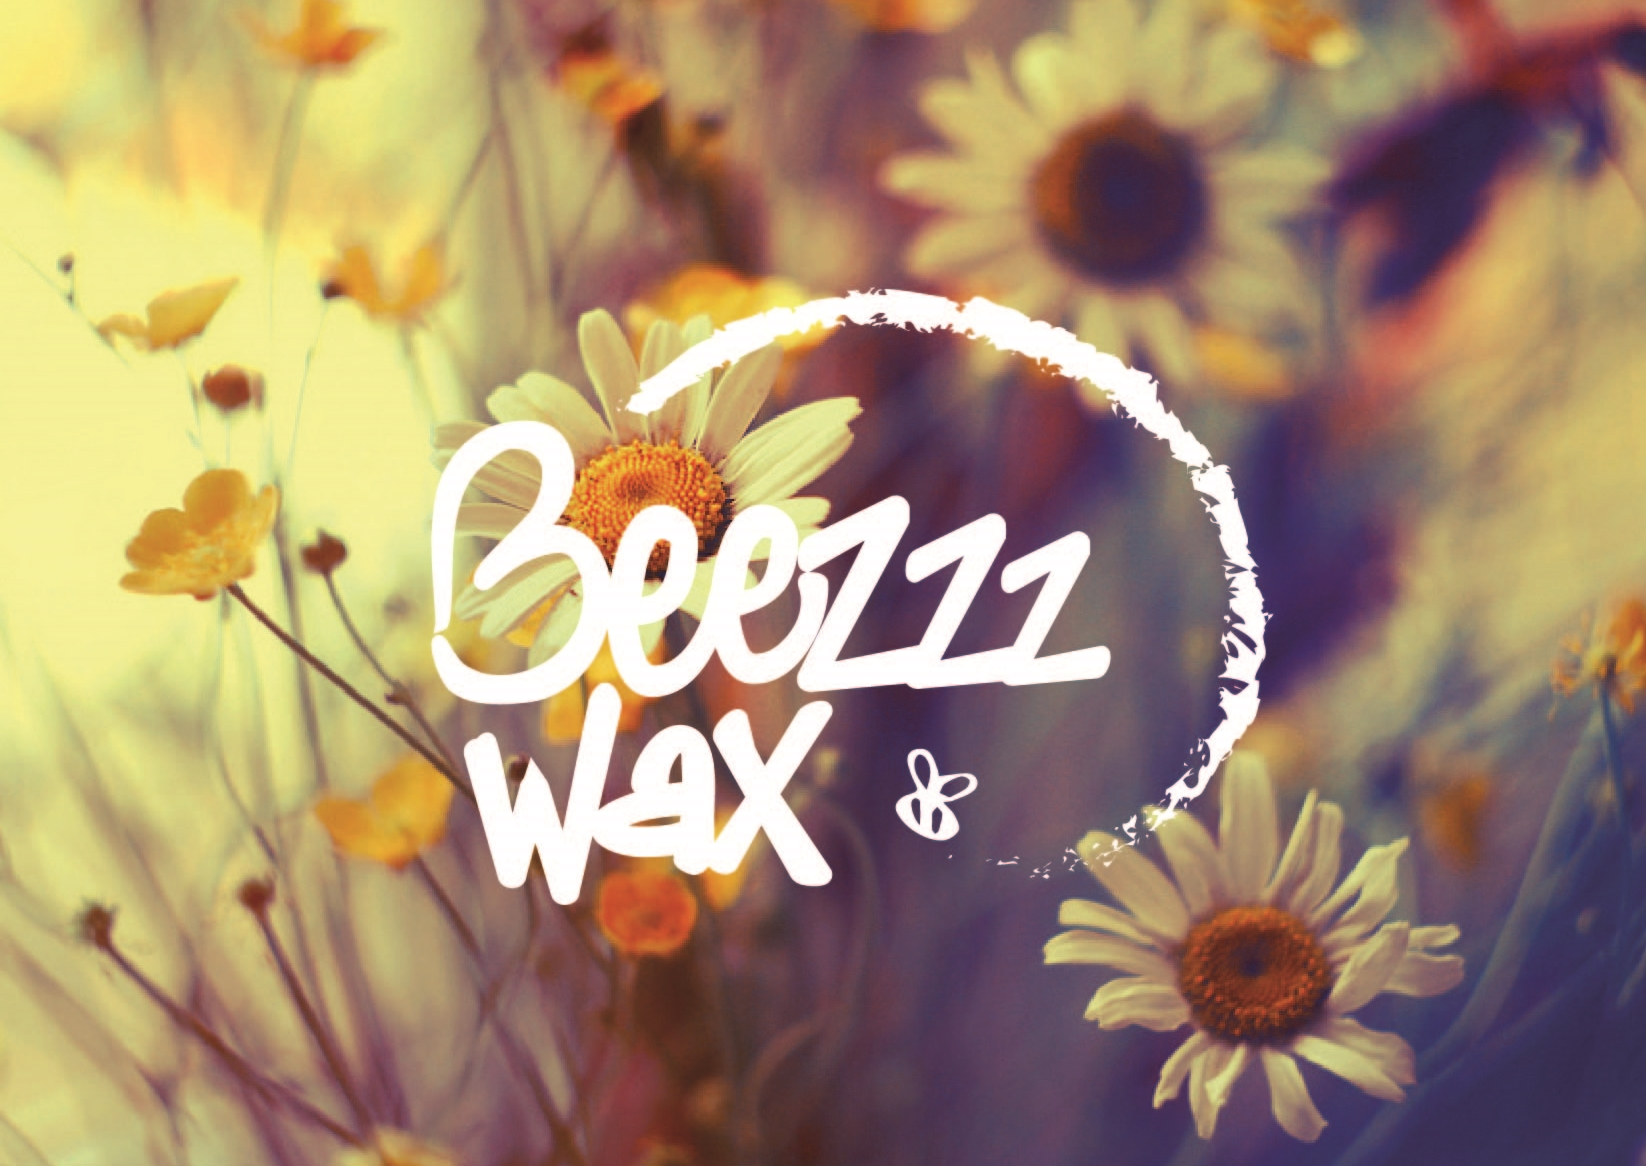 Beezzz Wax.jpg